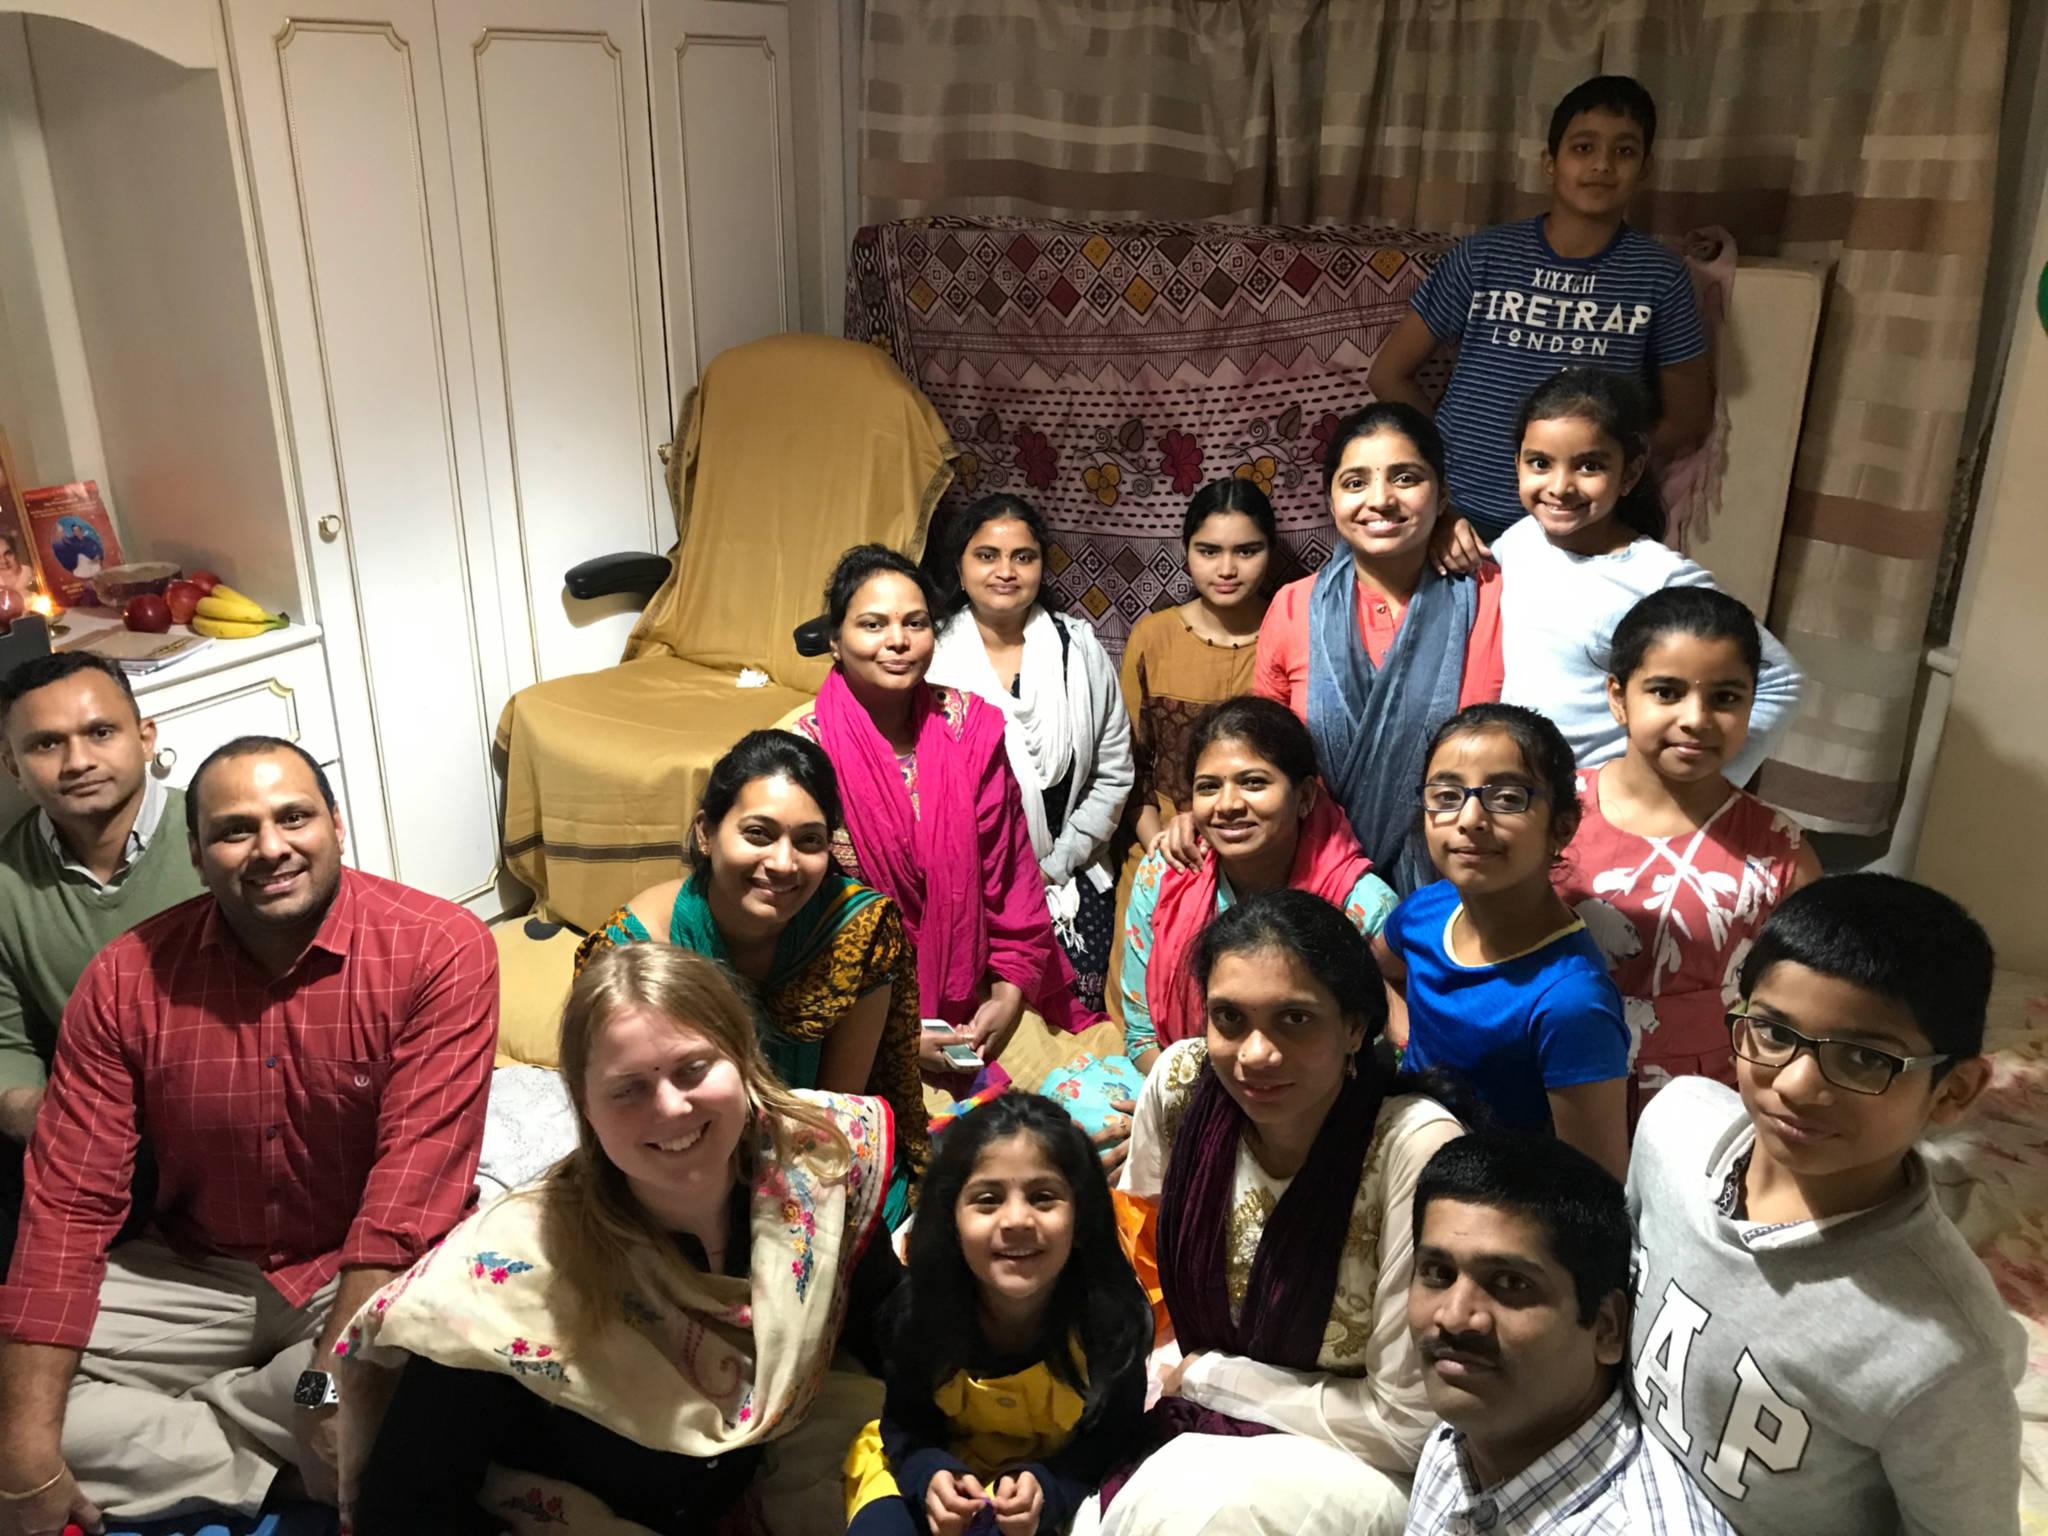 London – Monthly Aaradhana at Mr.BulliRaju's house on 11-Jan-2020